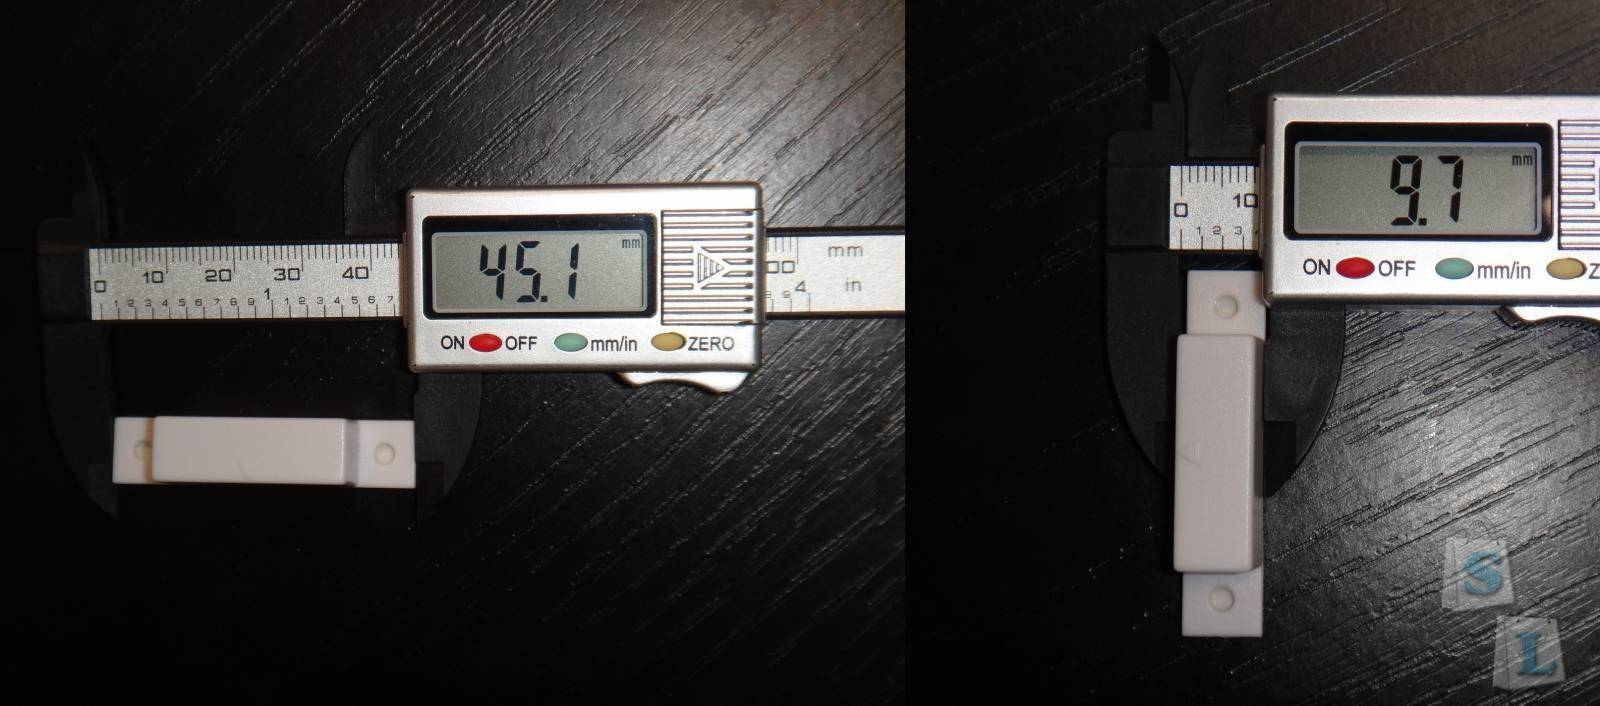 GearBest: Обзор домашней сигнализации на открытие дверей или окон KS-SF02LX